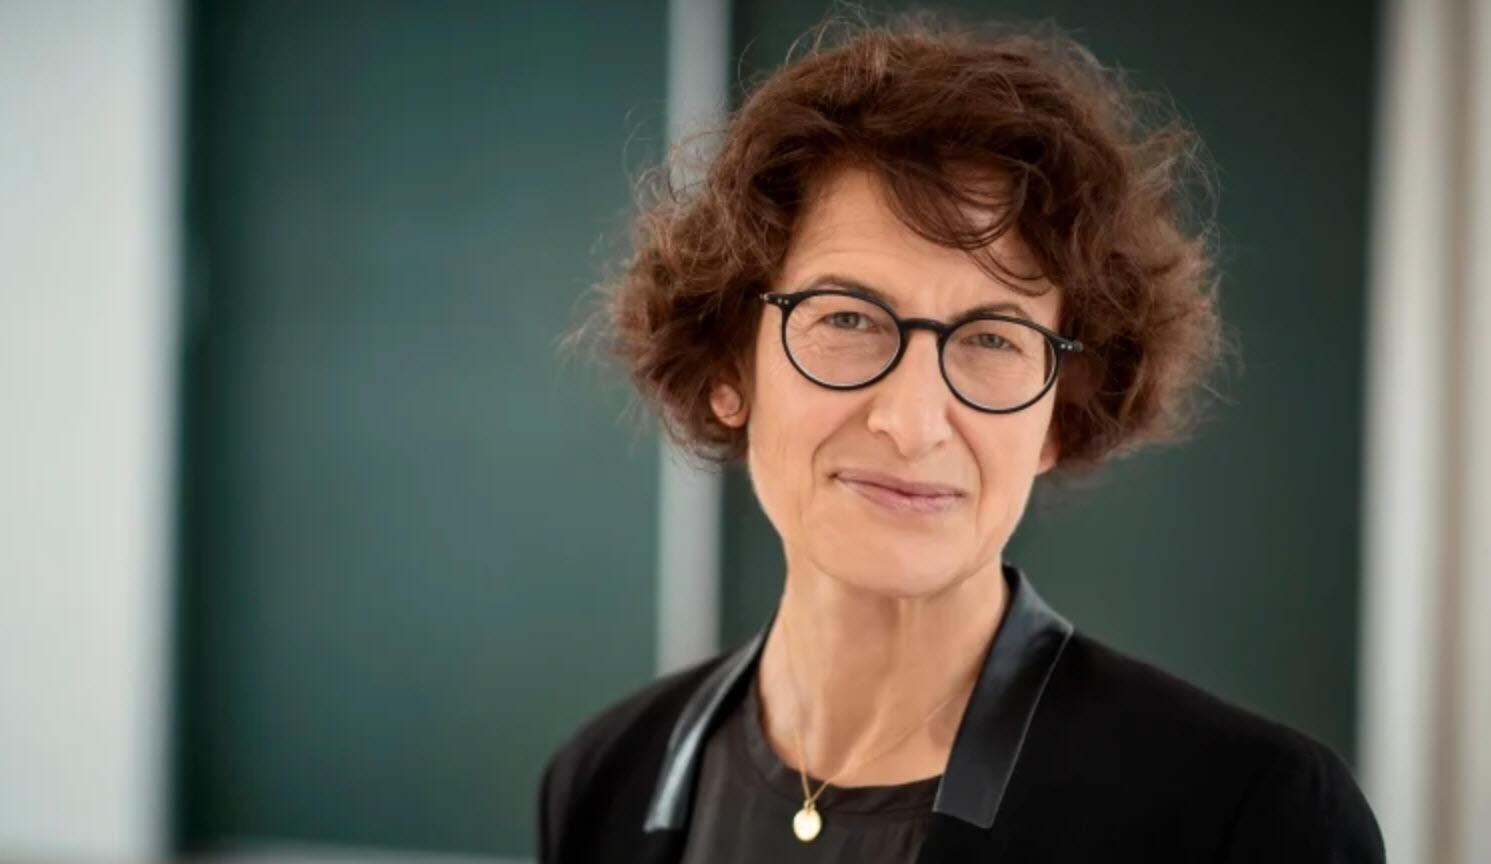 Dr. Ozlem Tureci